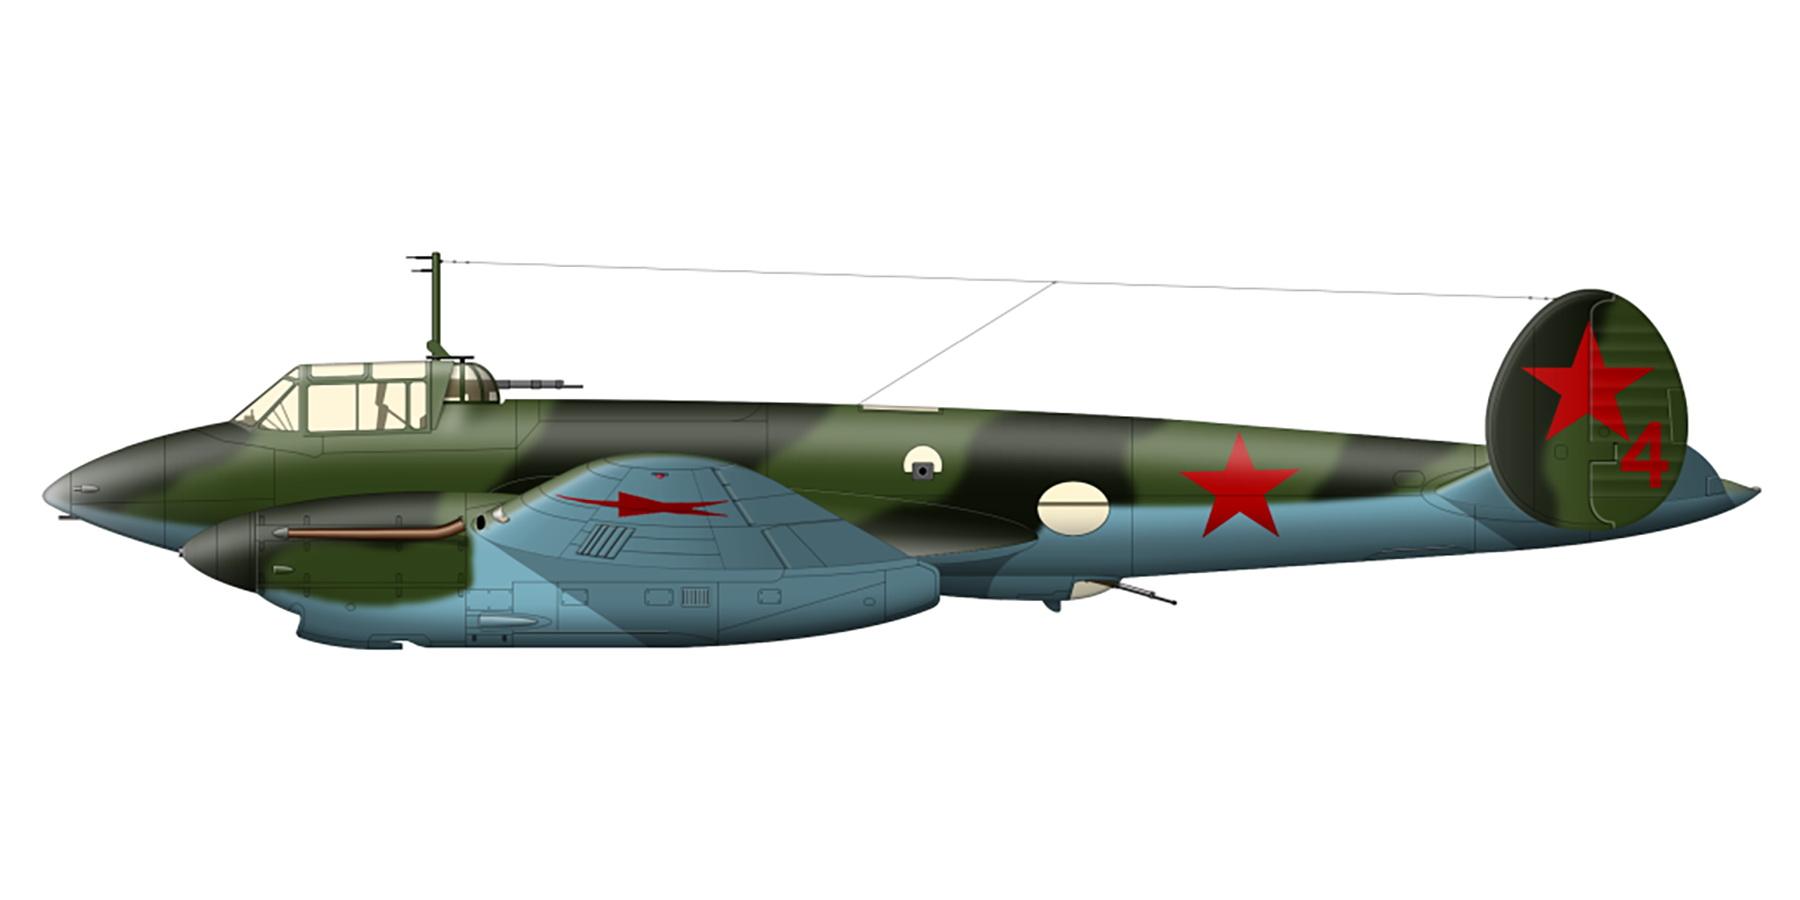 Petlyakov Pe 2 81GvBAP Red 4 Battle of Kursk 1943 0A